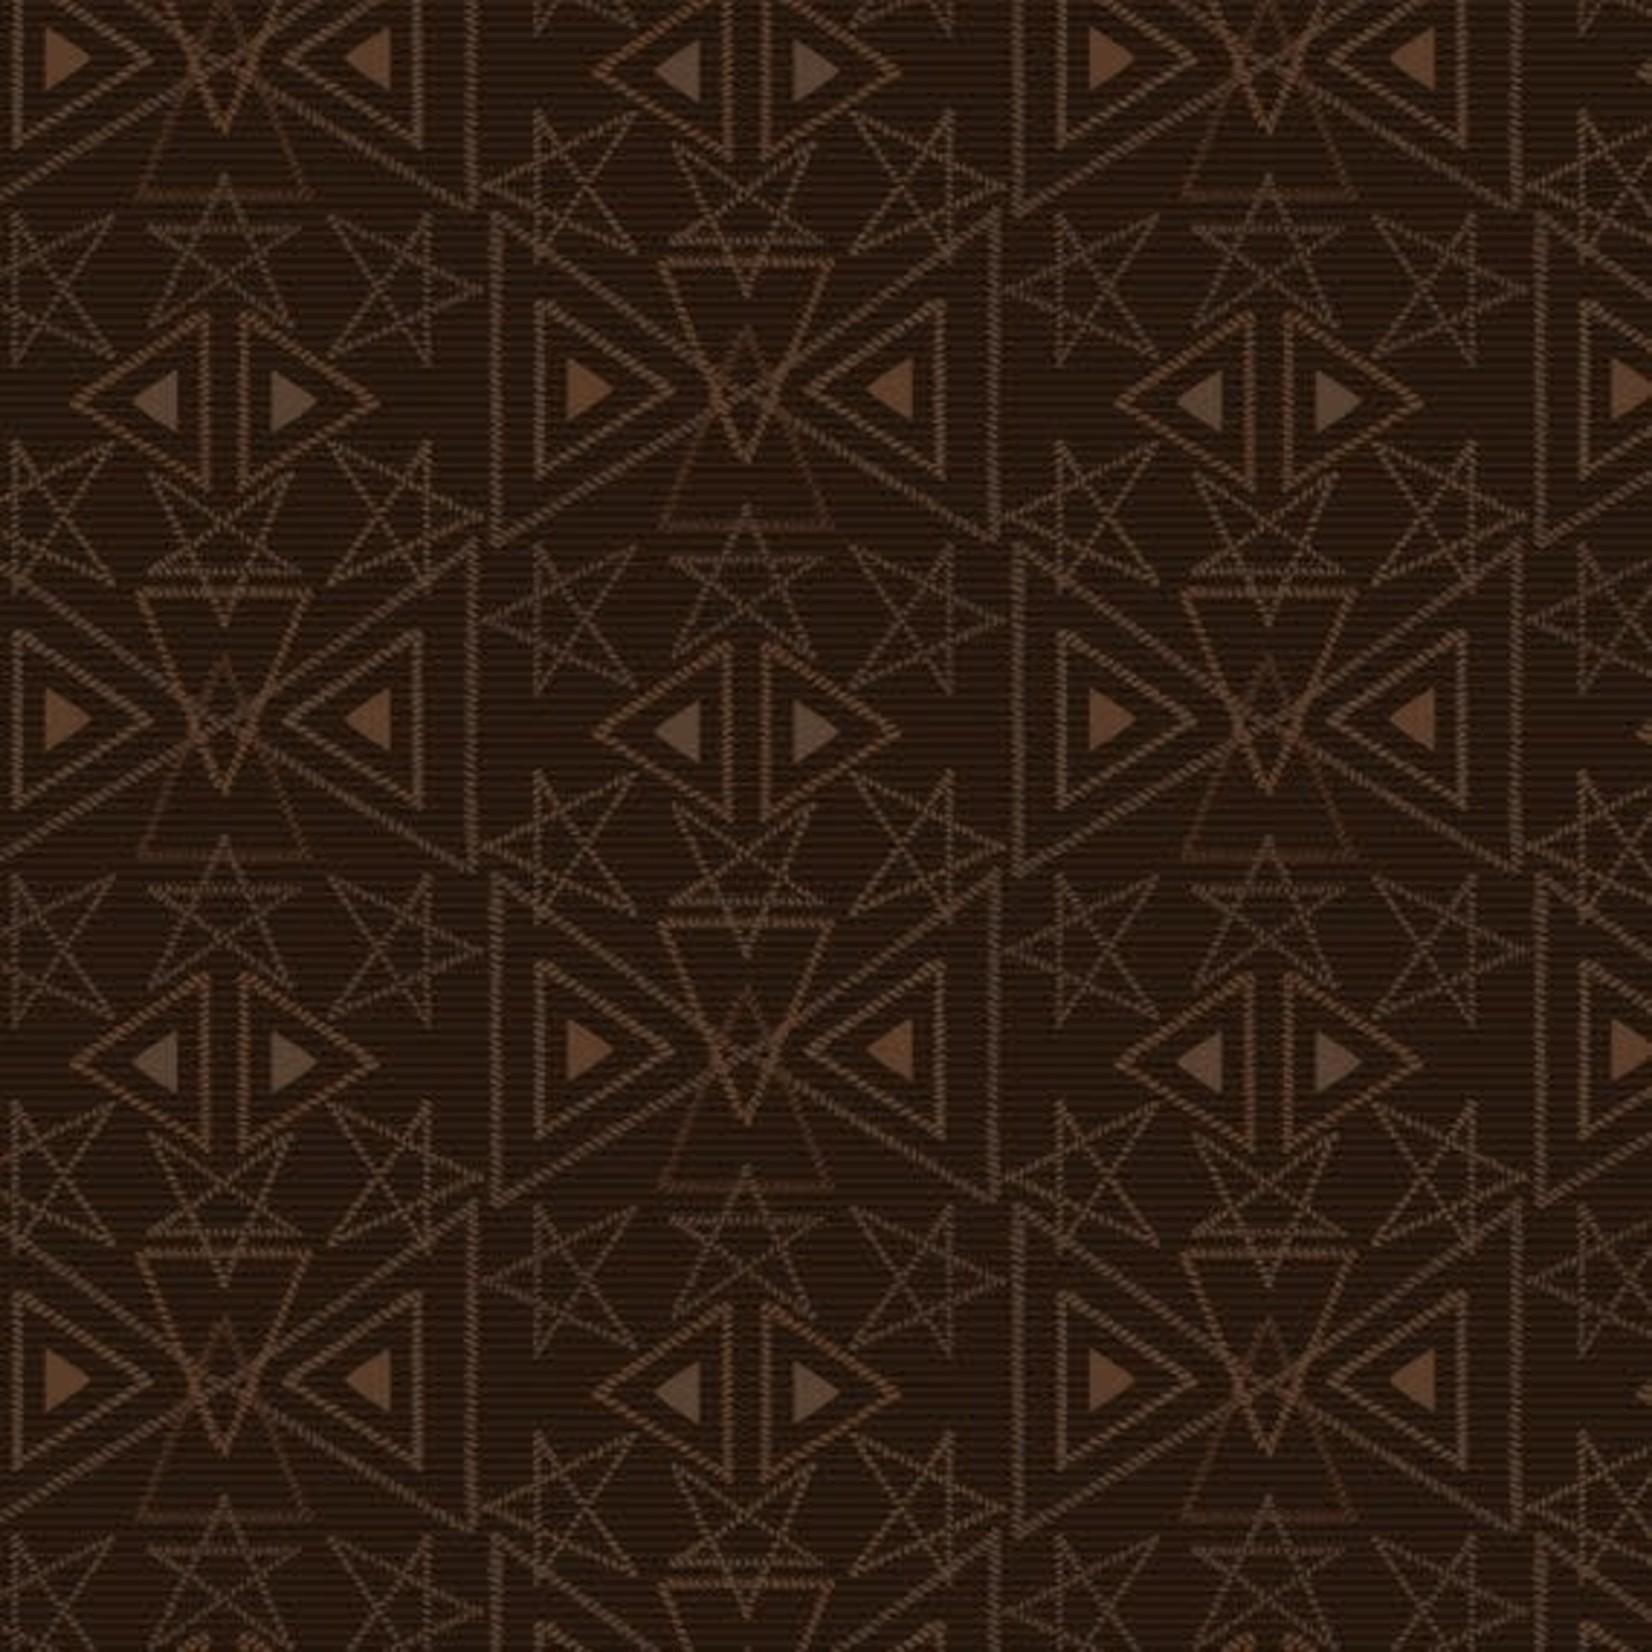 Henry Glass Fabrics Best Of Days - Star Geo - Brown